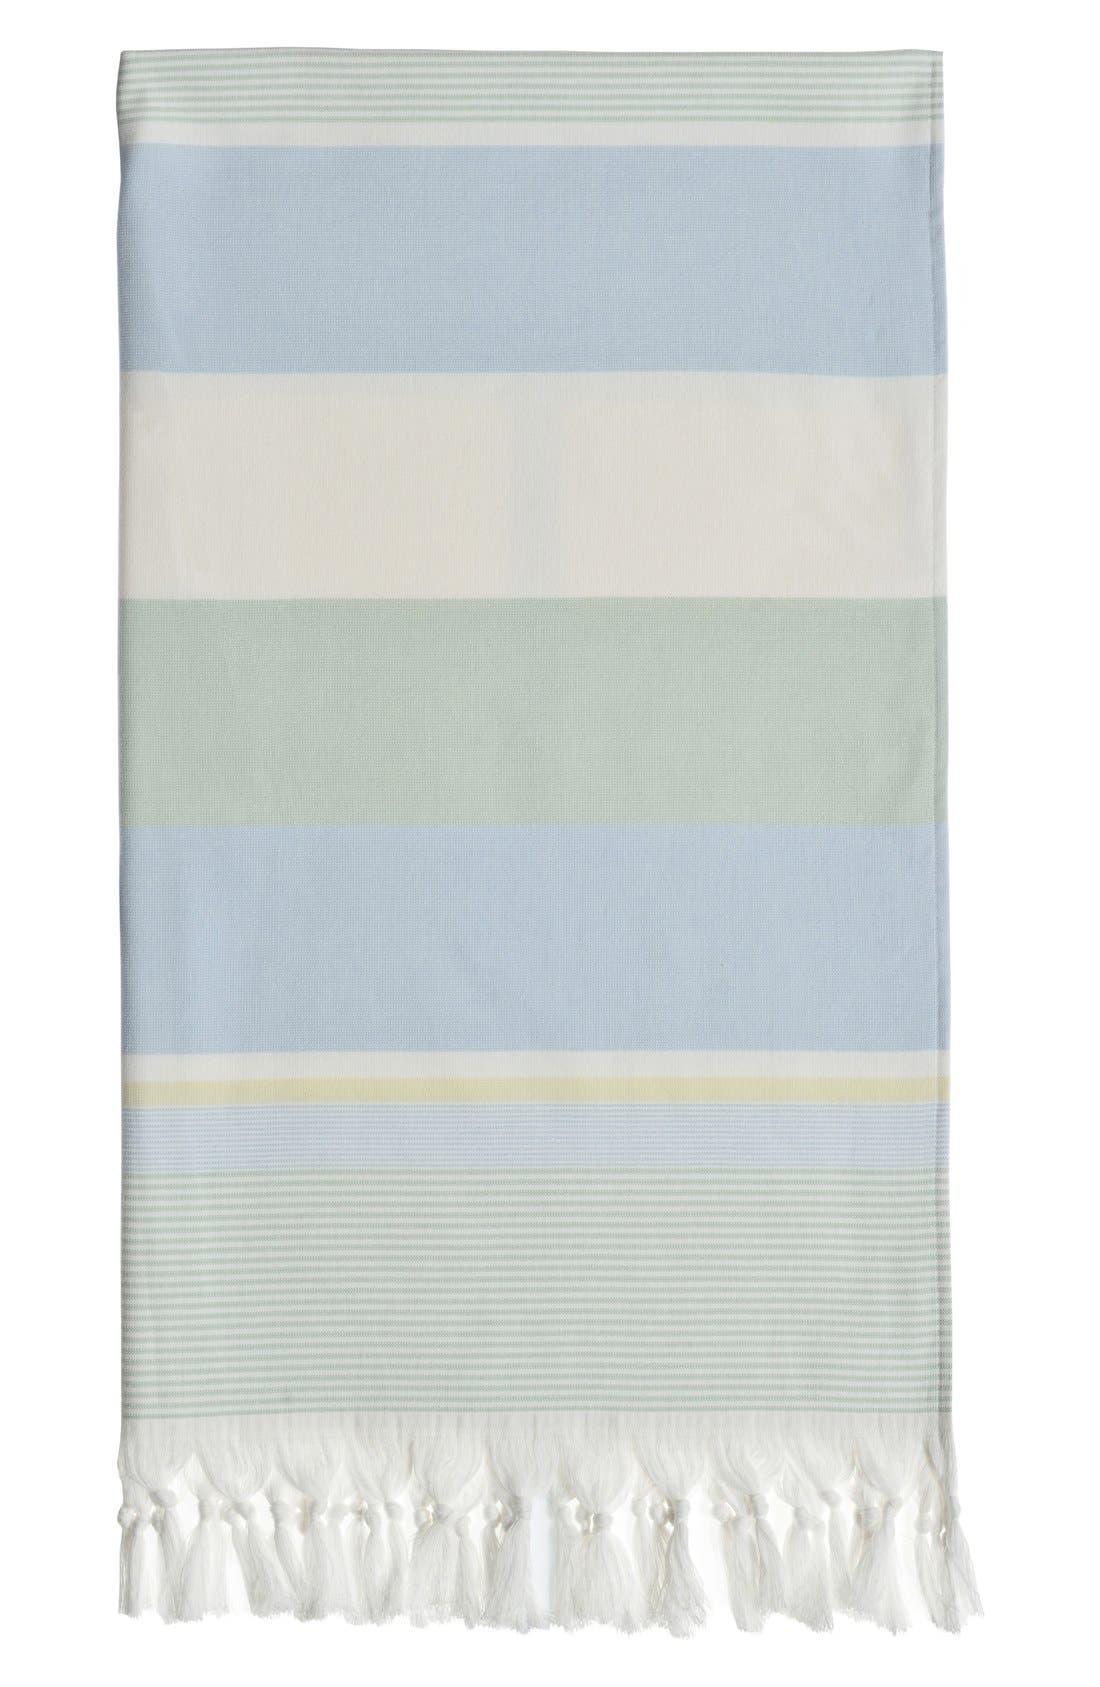 'Summer Loving' Turkish Pestemal Towel,                             Alternate thumbnail 3, color,                             Sky Blue